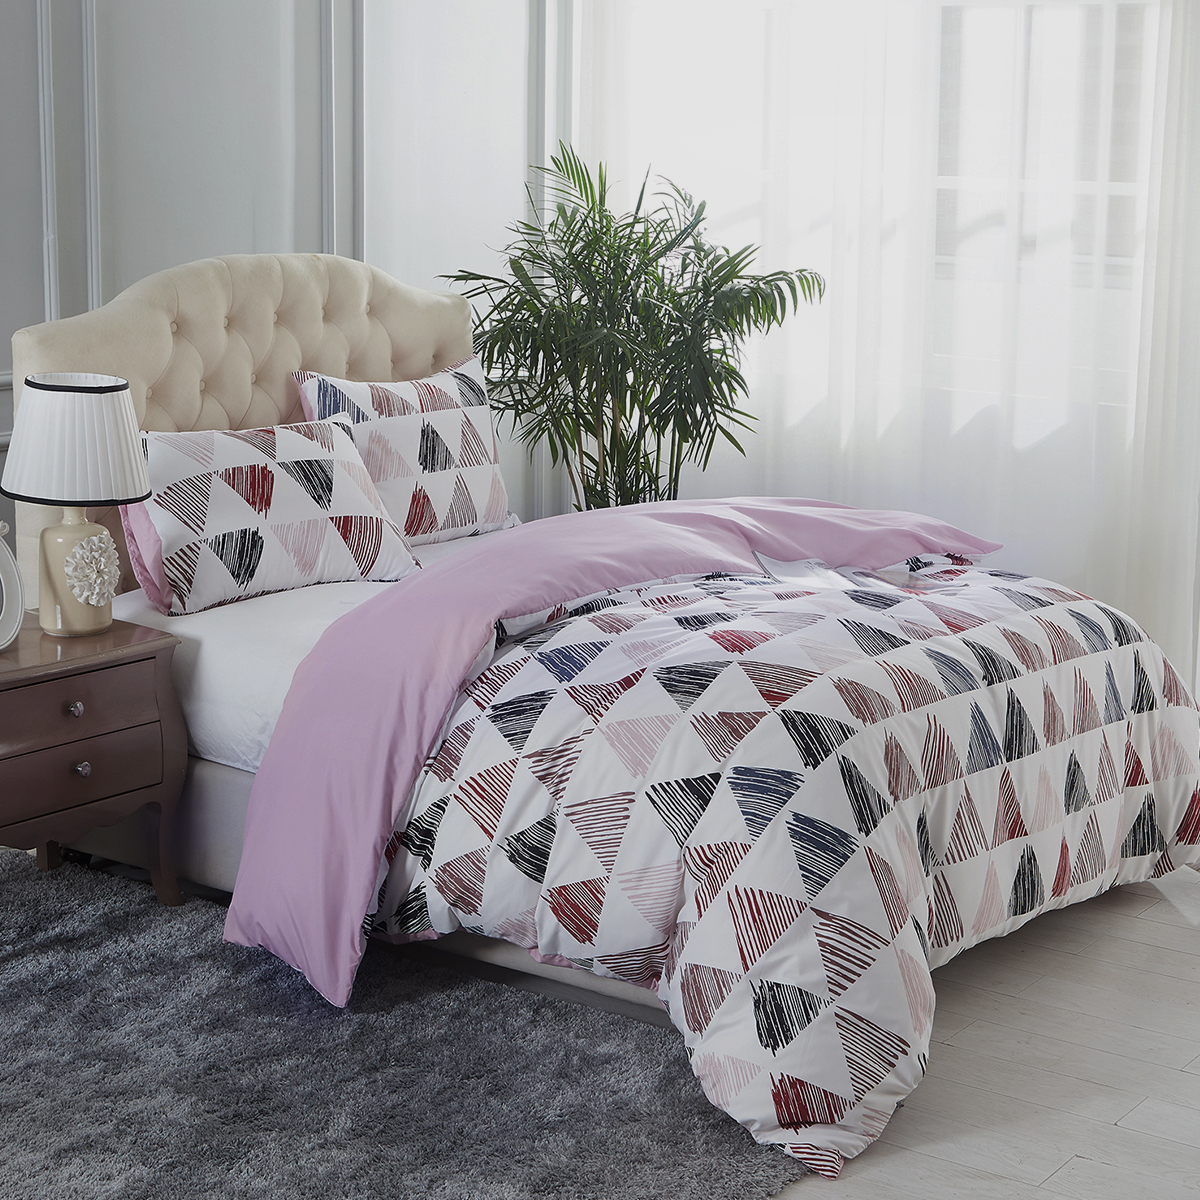 Super Soft Luxury 3 Piece Printed Duvet Cover Set,Queen Size